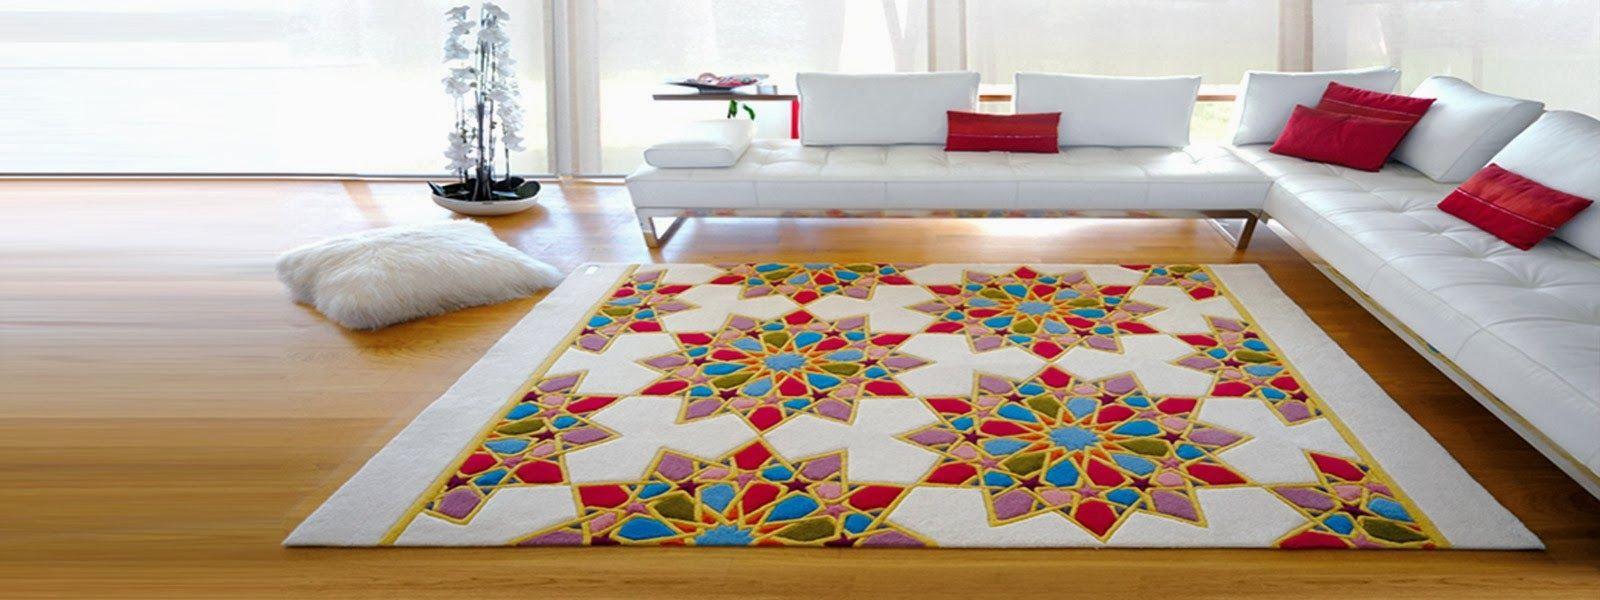 Tapis Marocain Traditionnel 2014 L Artisanat Pinterest Salon